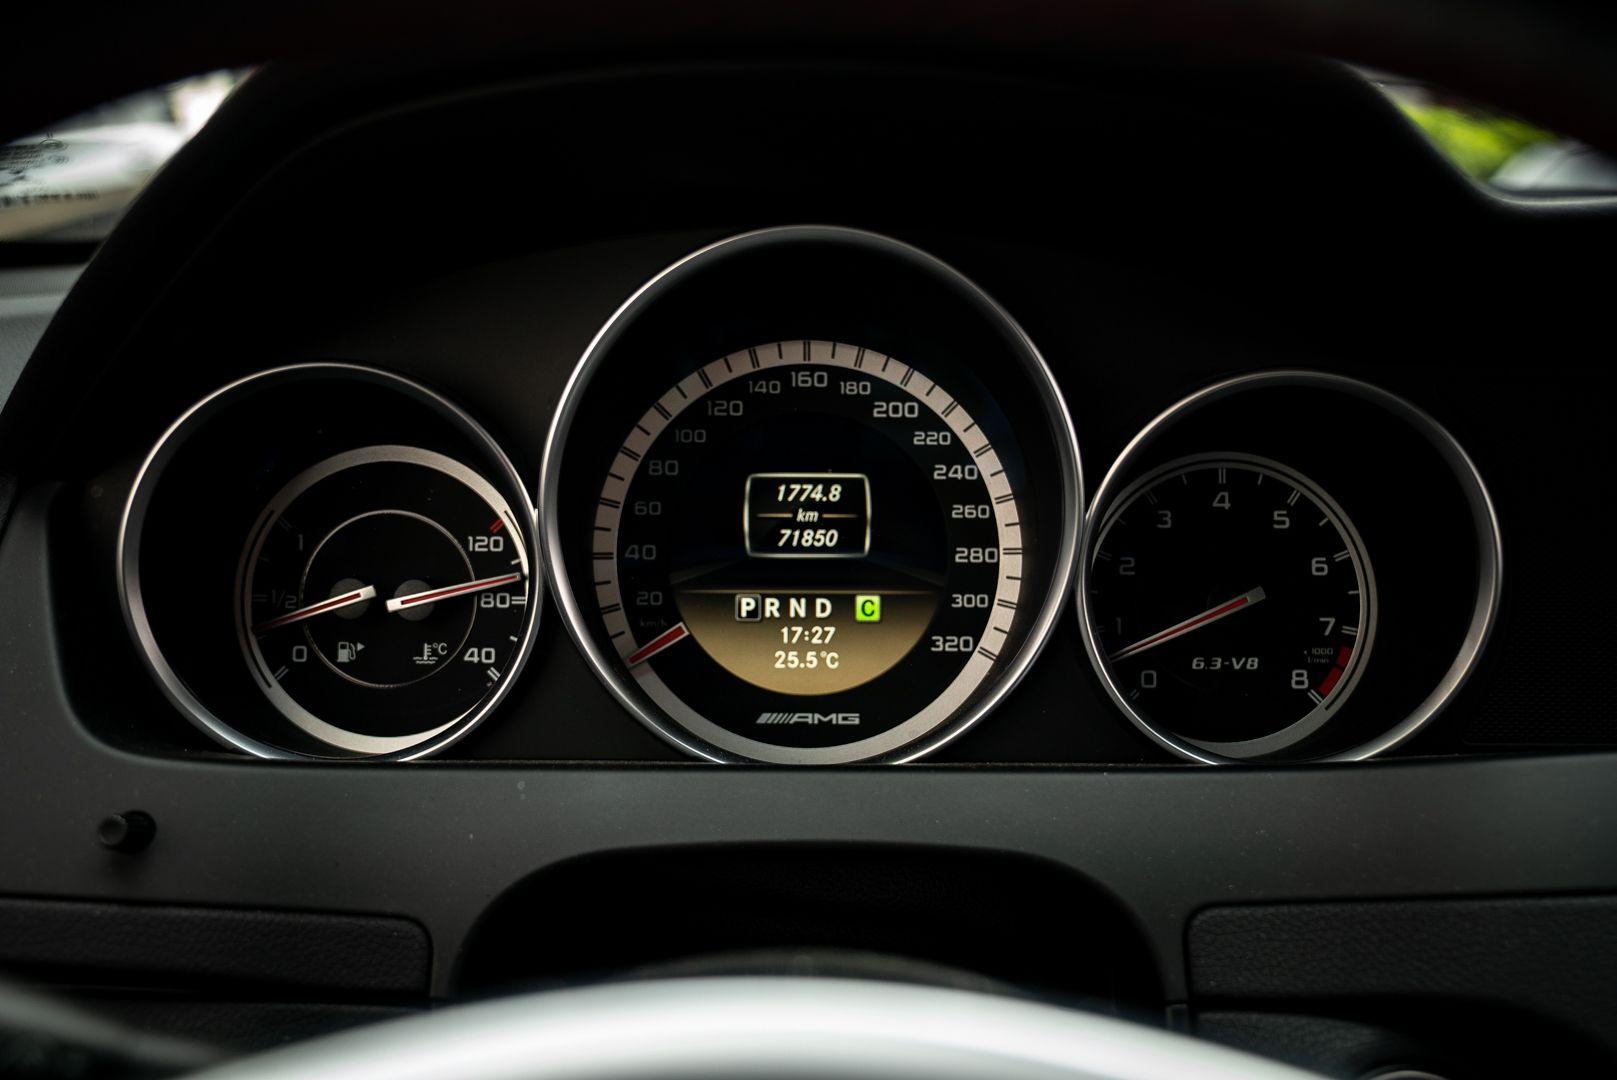 2012 Mercedes-Benz C63 AMG Black Series 71805